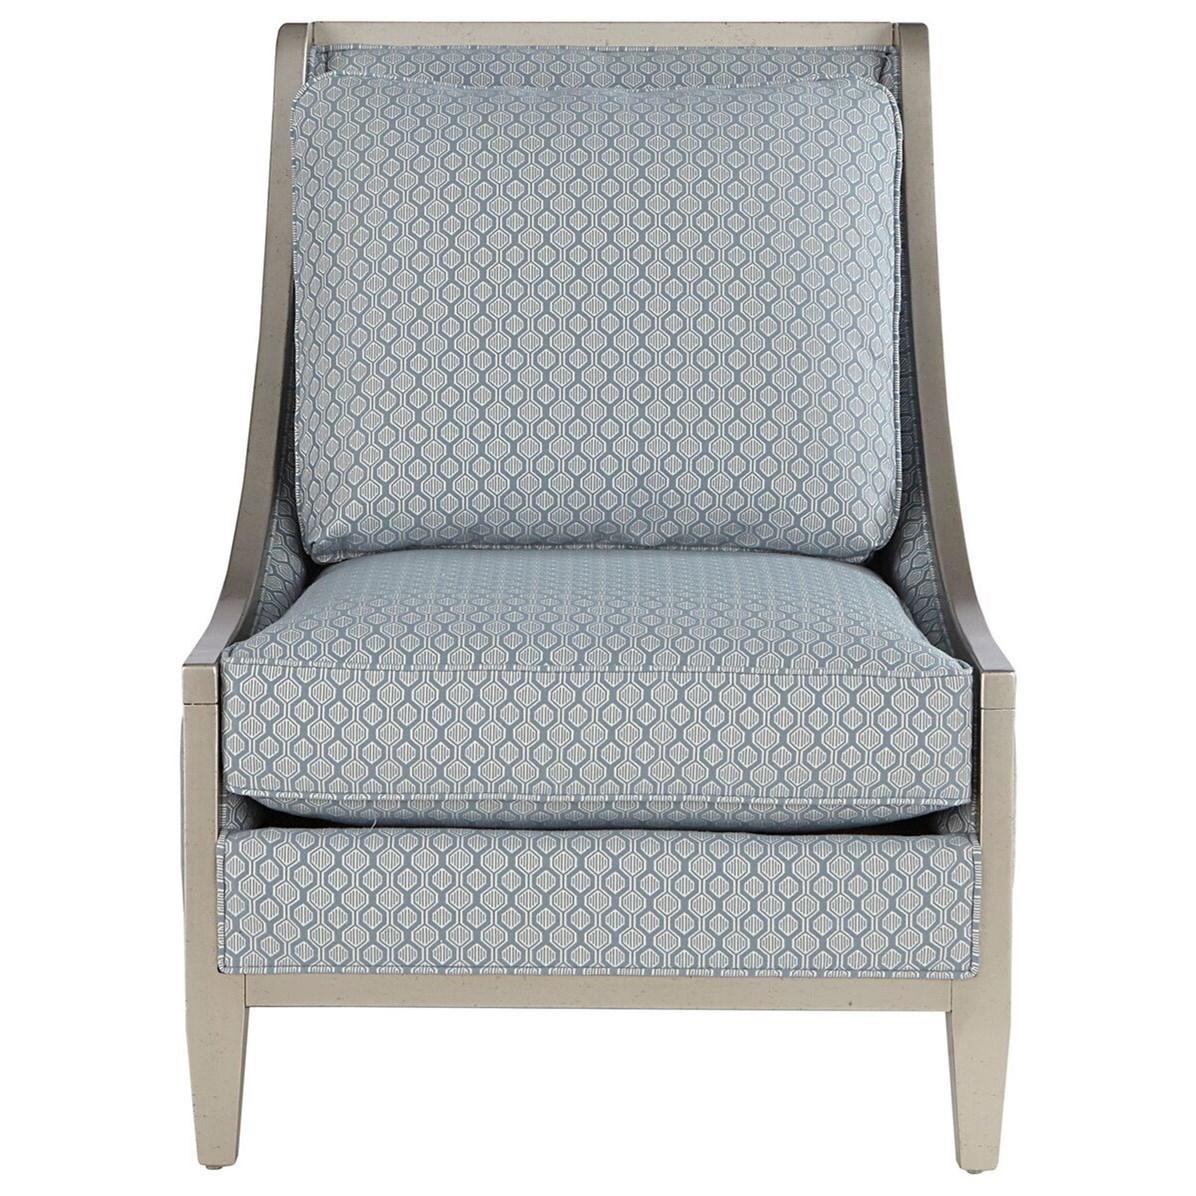 Bon A.R.T. Furniture Inc MorganWood Frame Accent Chair ...